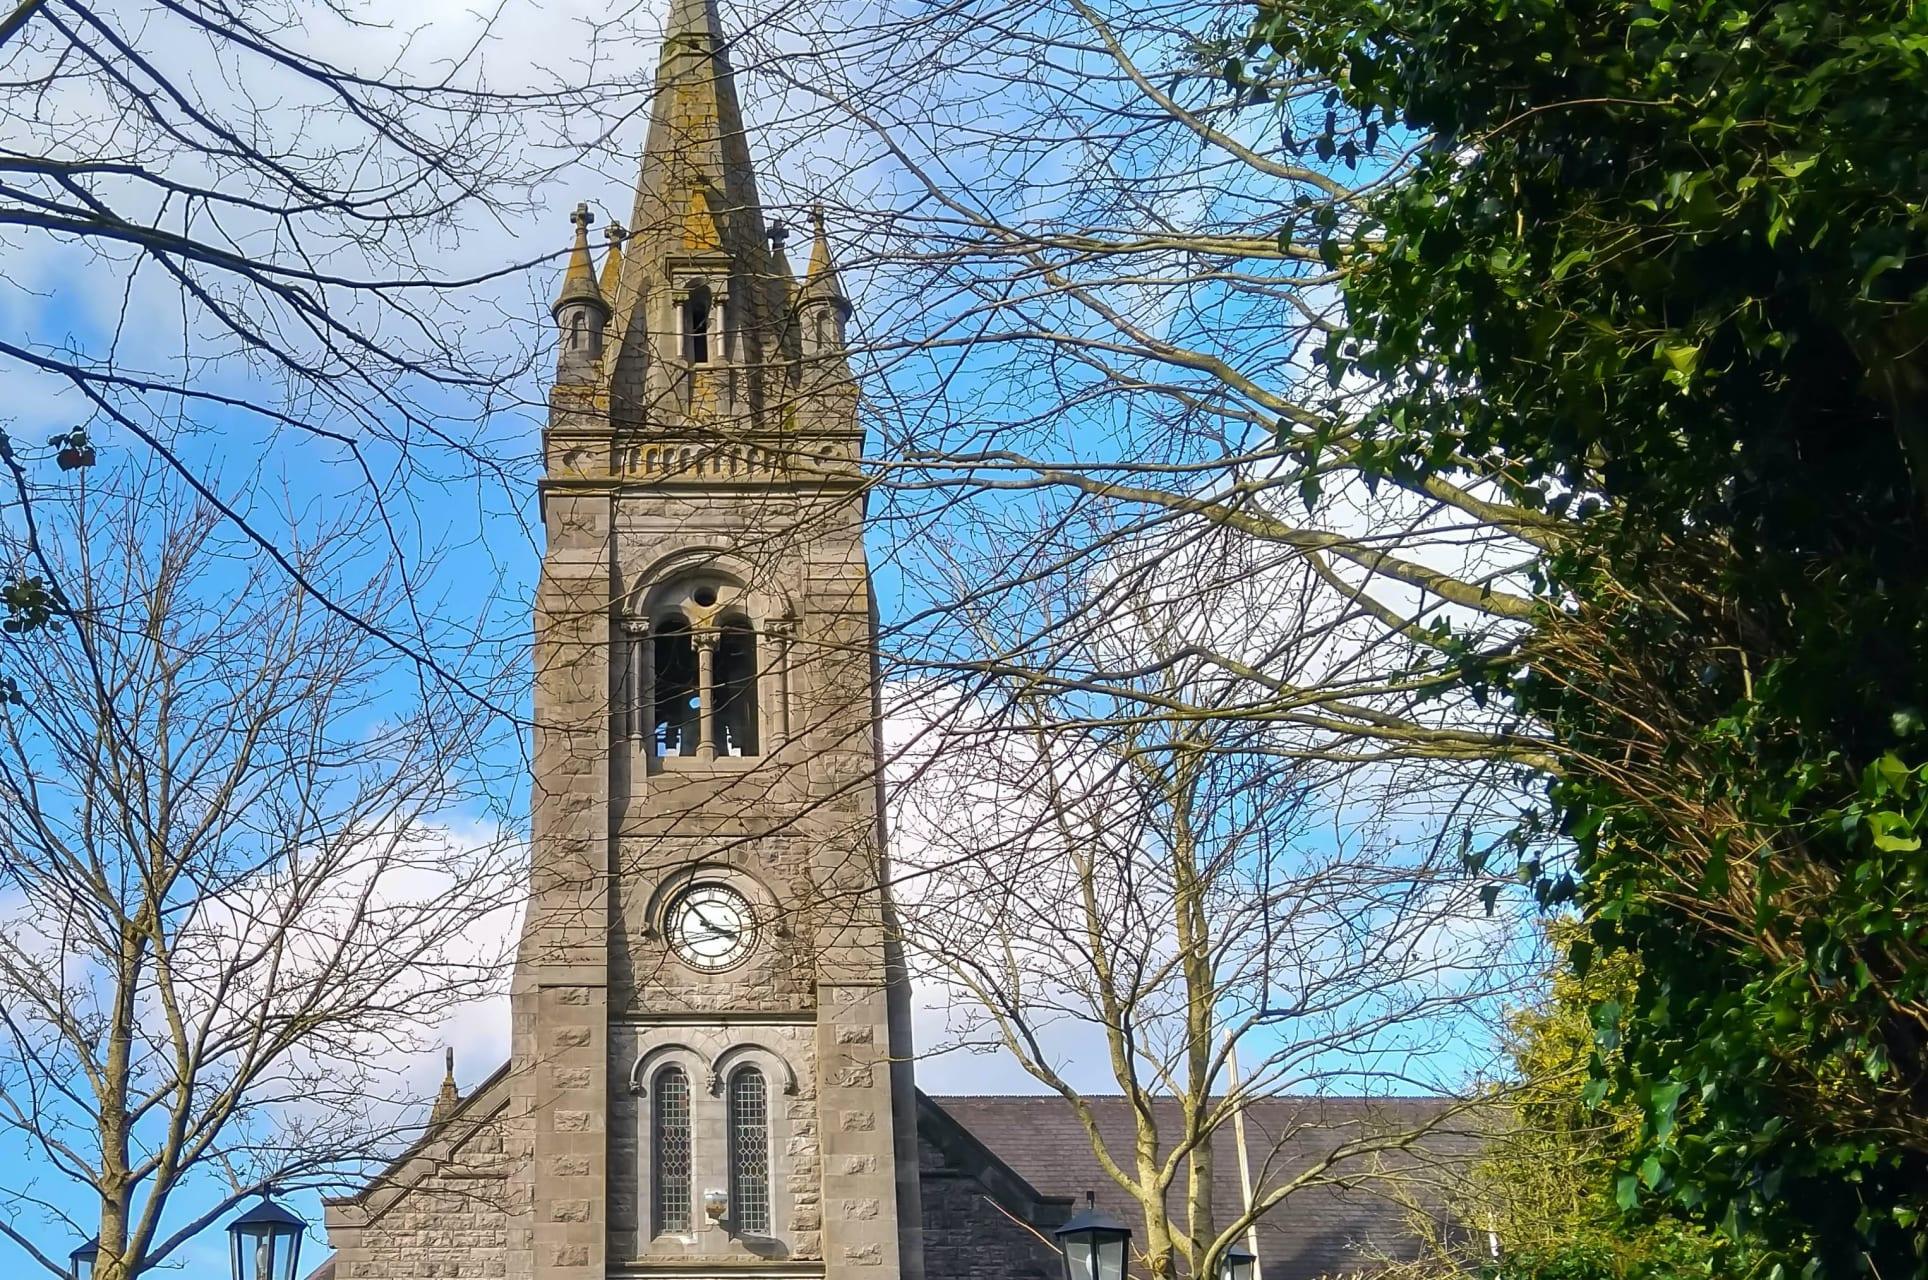 Co. Laois - Abbeyleix - The Planned Estate Town of the Viscounts de Vesci in Ireland